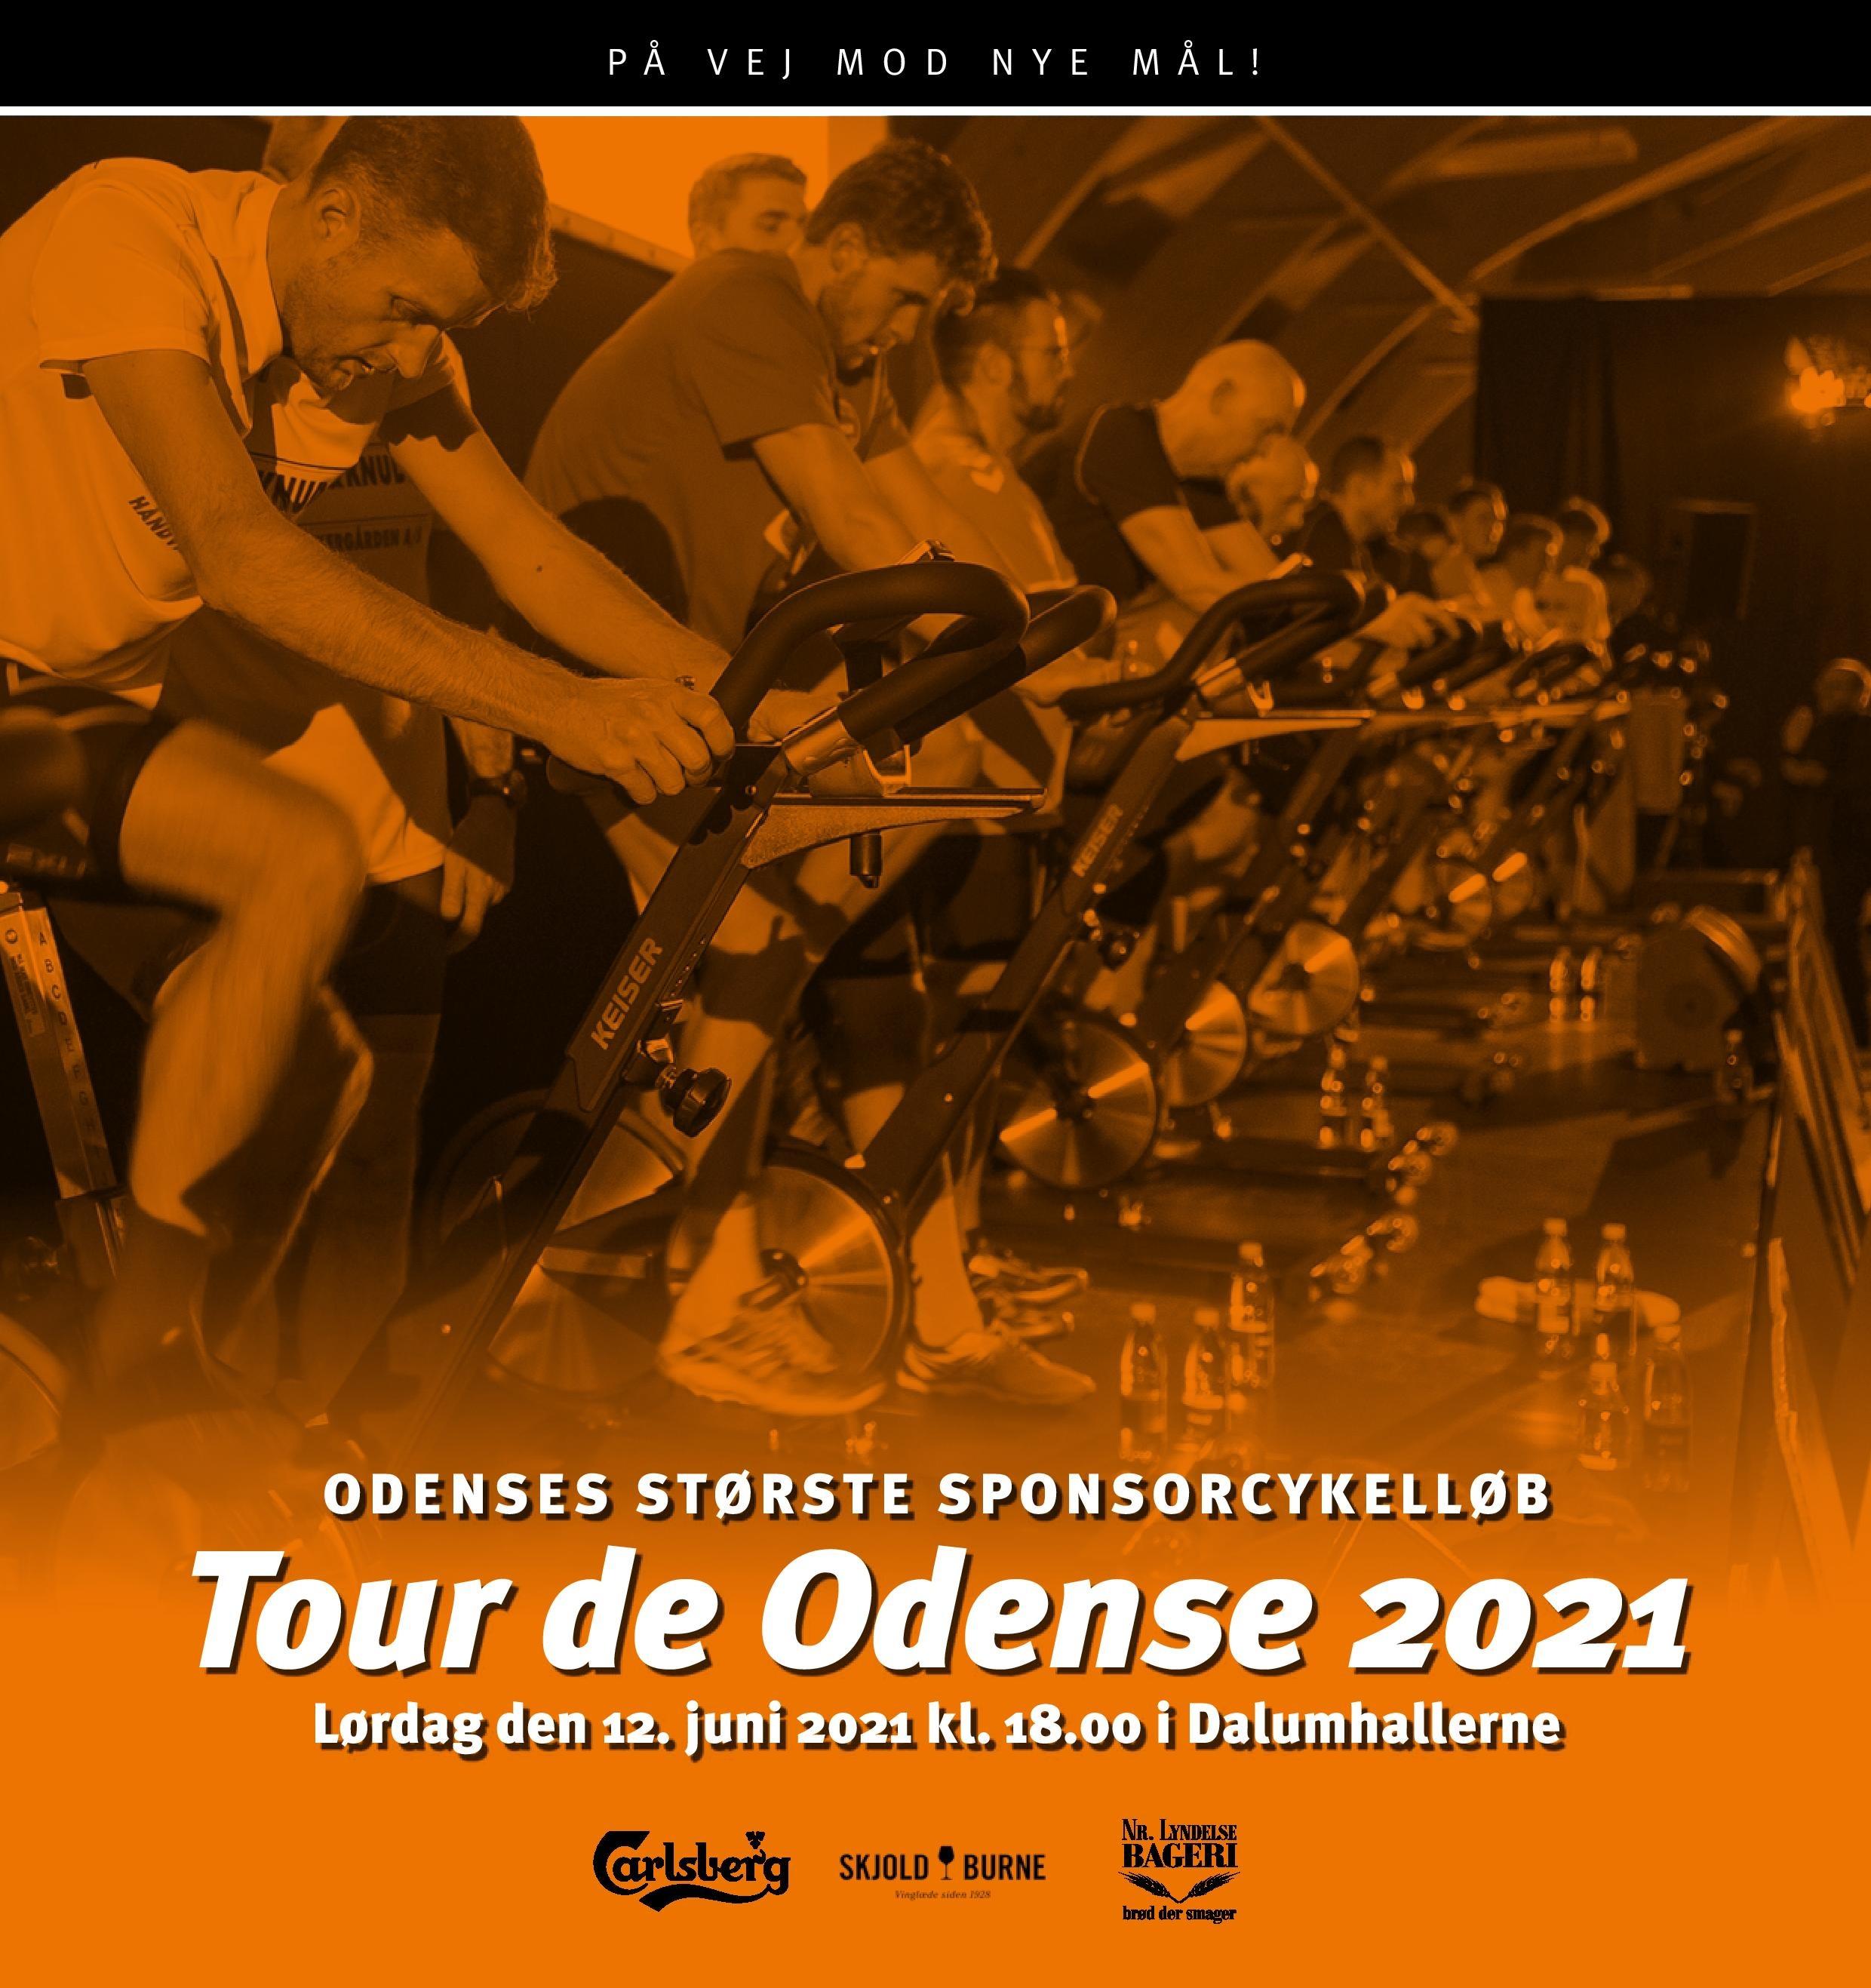 Tour de Odense 21